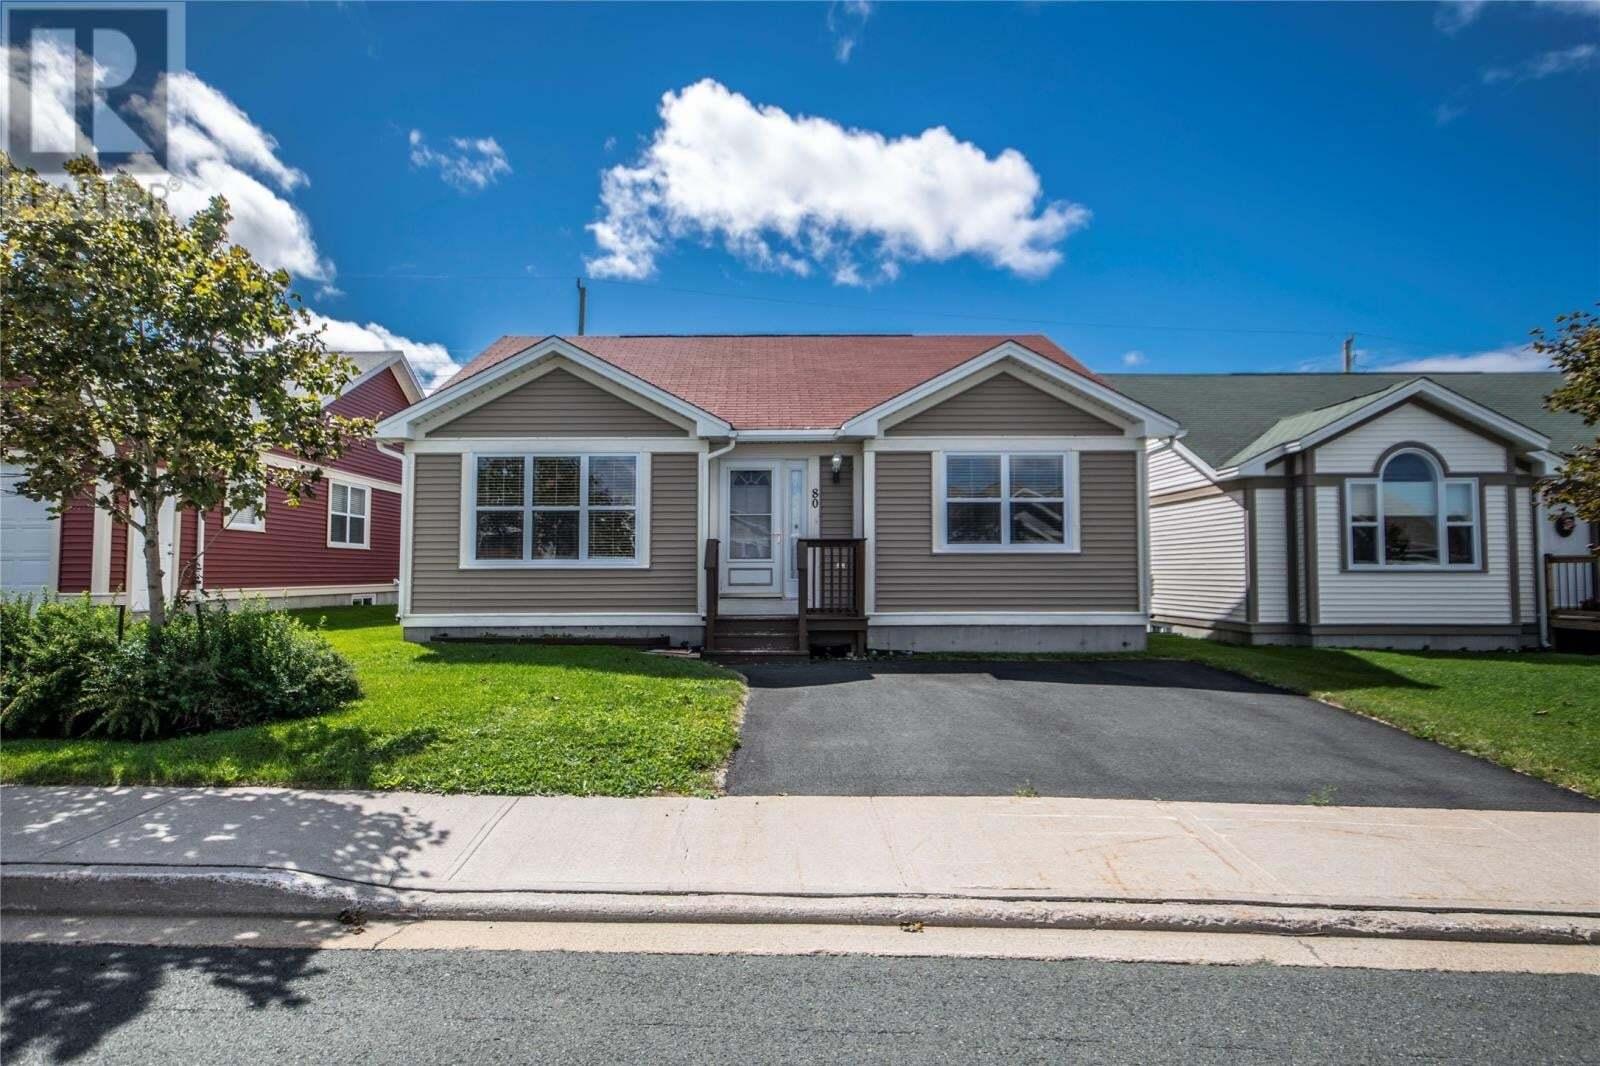 House for sale at 80 Shortall St St. John's Newfoundland - MLS: 1220799